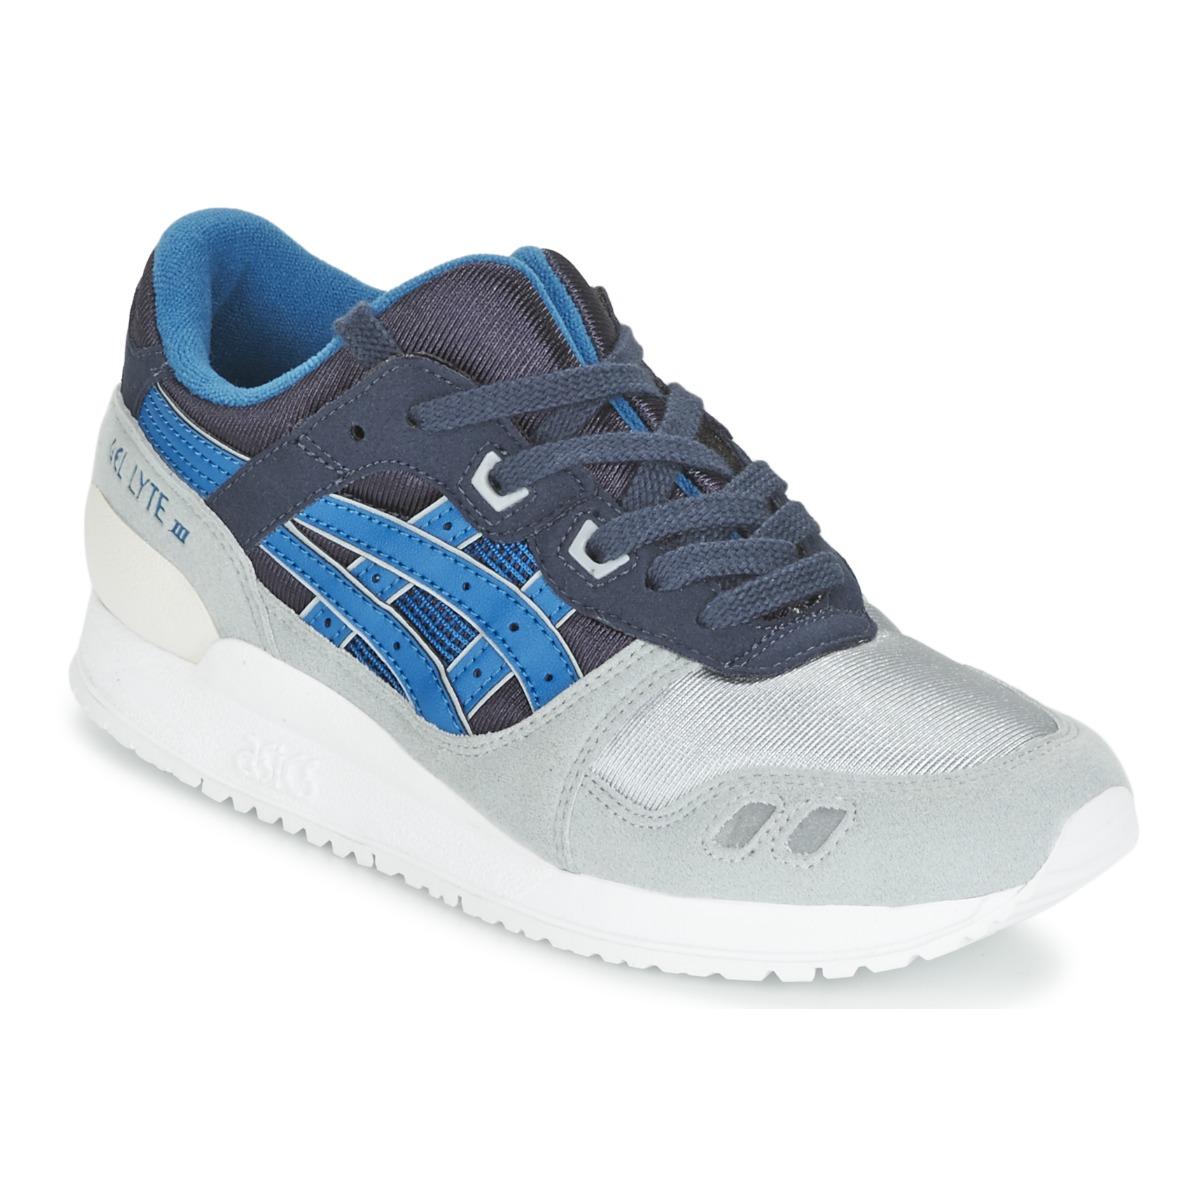 asics gel lyte iii gs bleu chaussure pas cher avec chaussures baskets basses. Black Bedroom Furniture Sets. Home Design Ideas